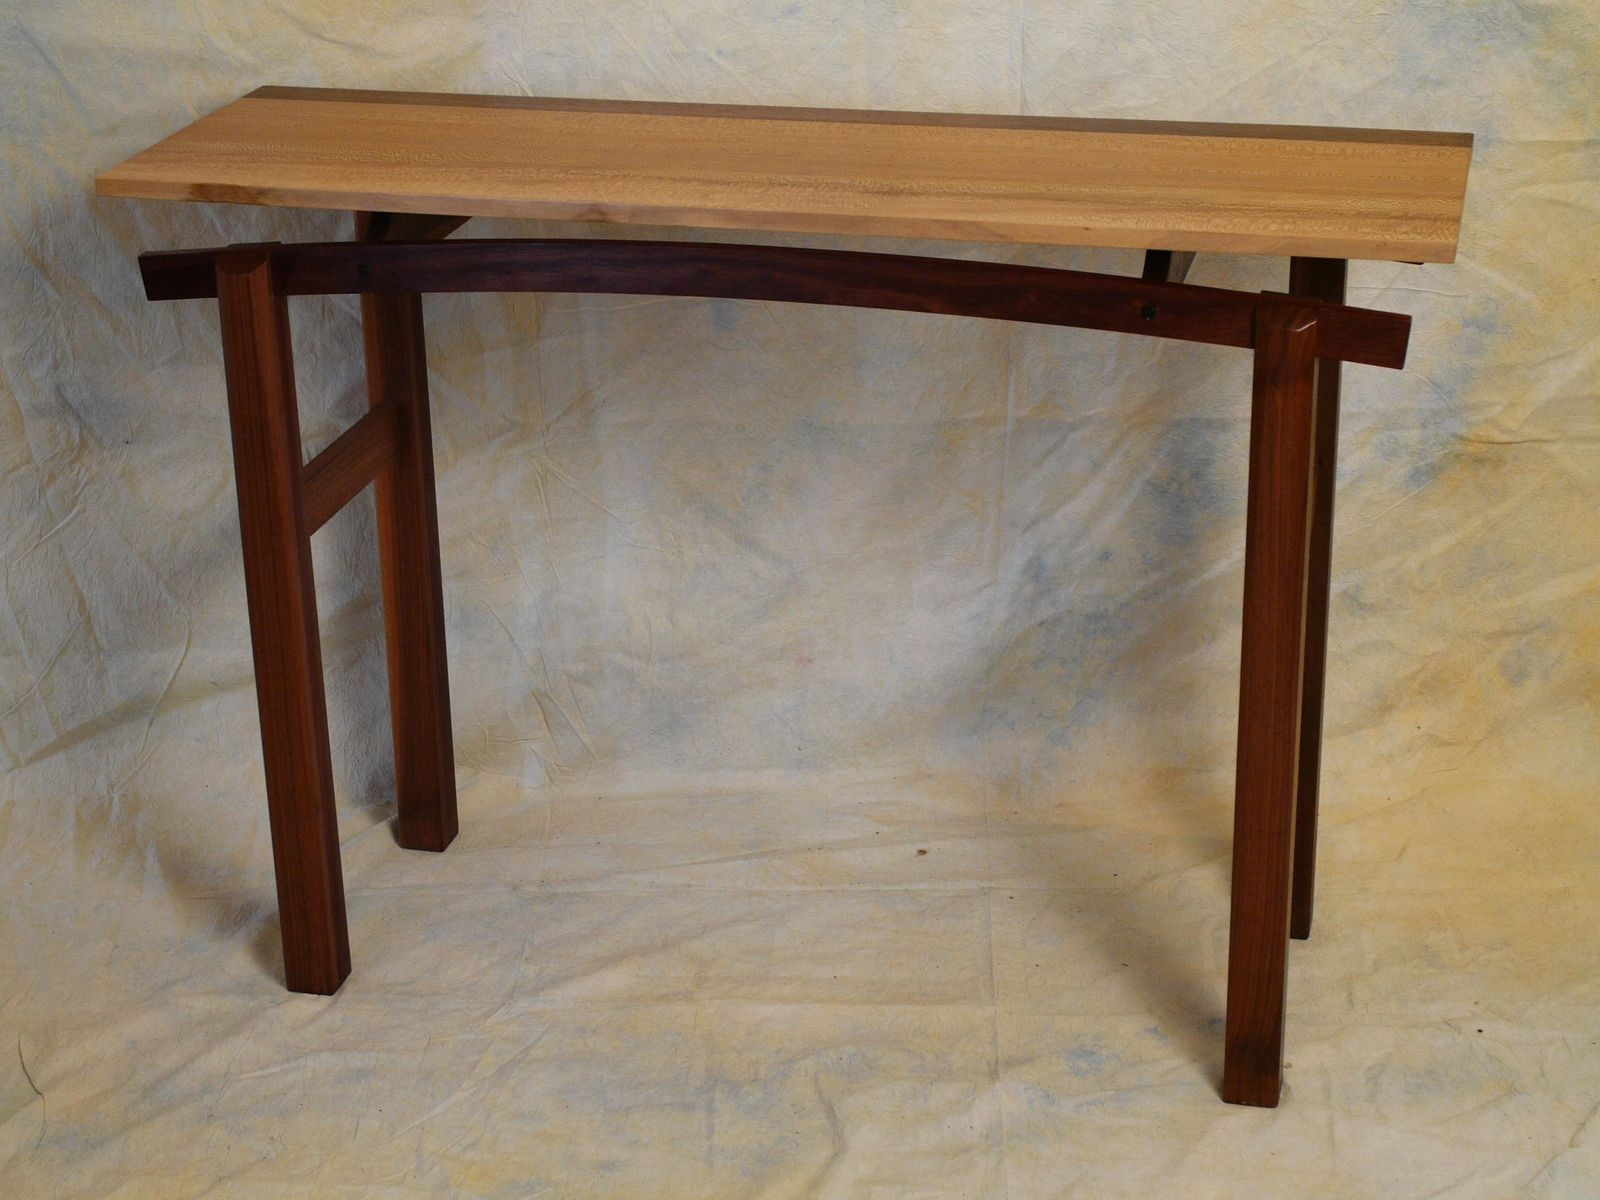 Custom Made Hall Table By Taos Woodshop Custommade Com